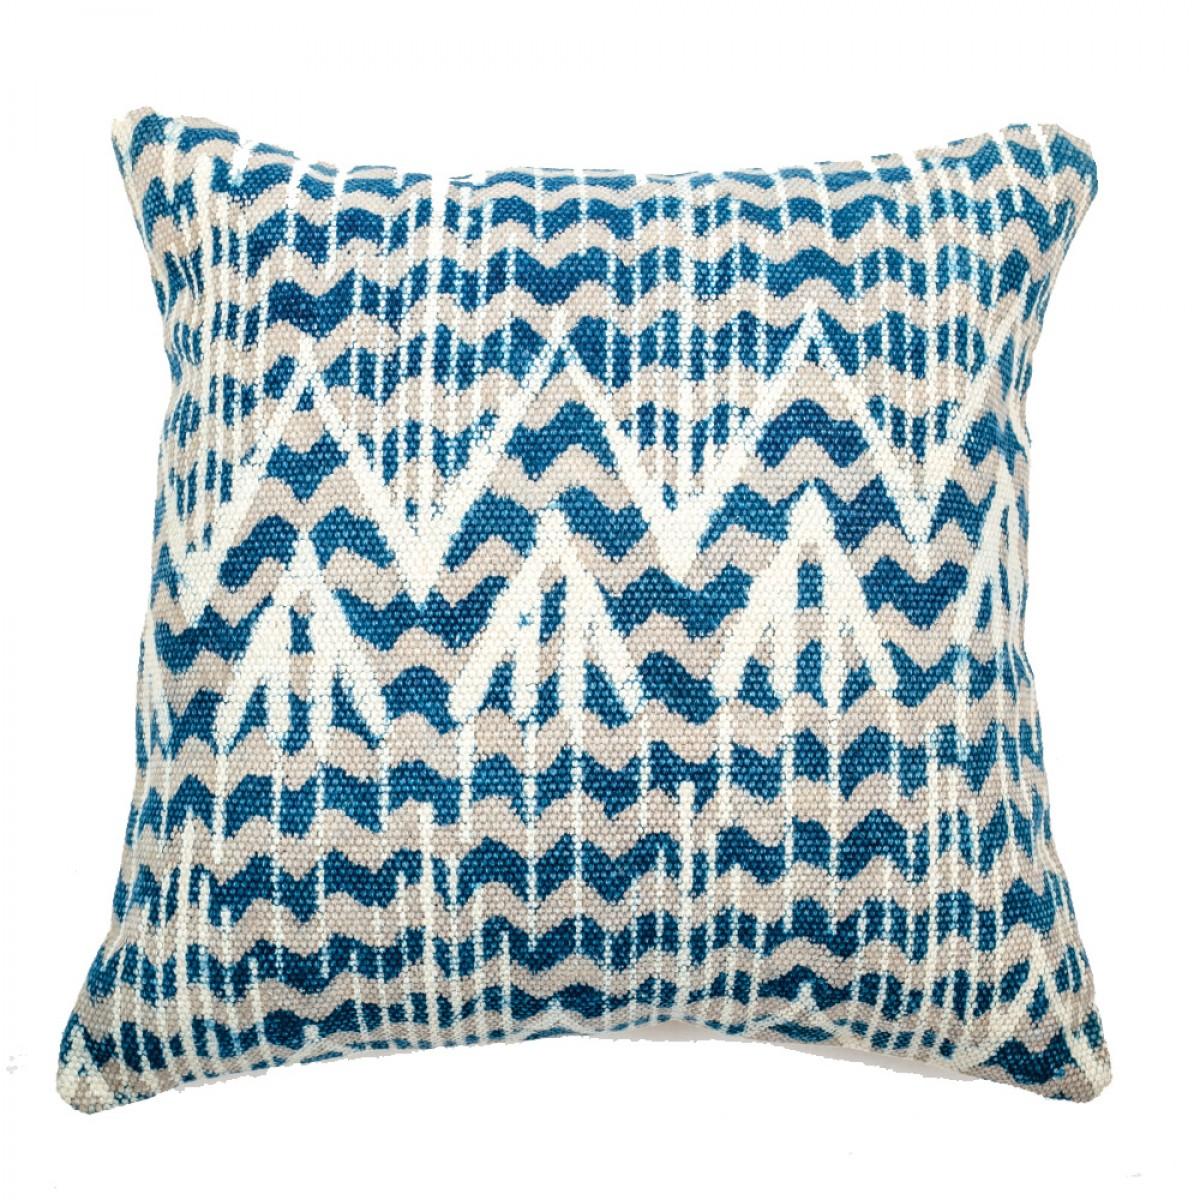 Indigo Cotton Cushion Cover - Zig Zag